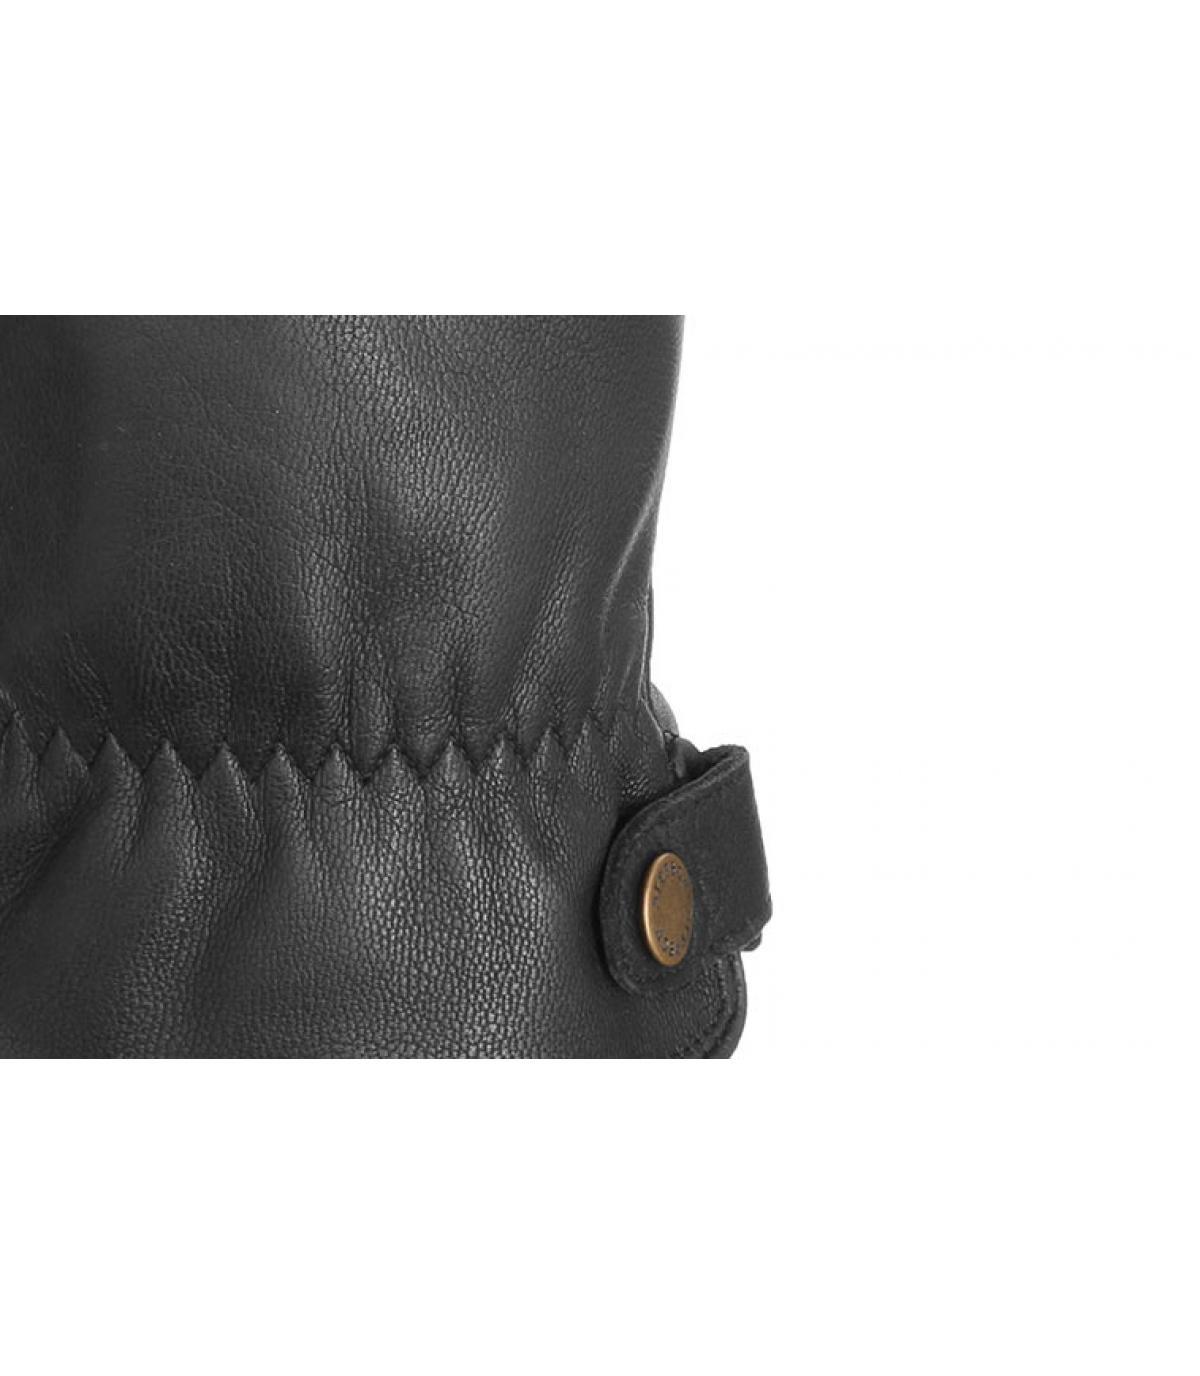 Details Gloves Goat Nappa Conductive black - Abbildung 2